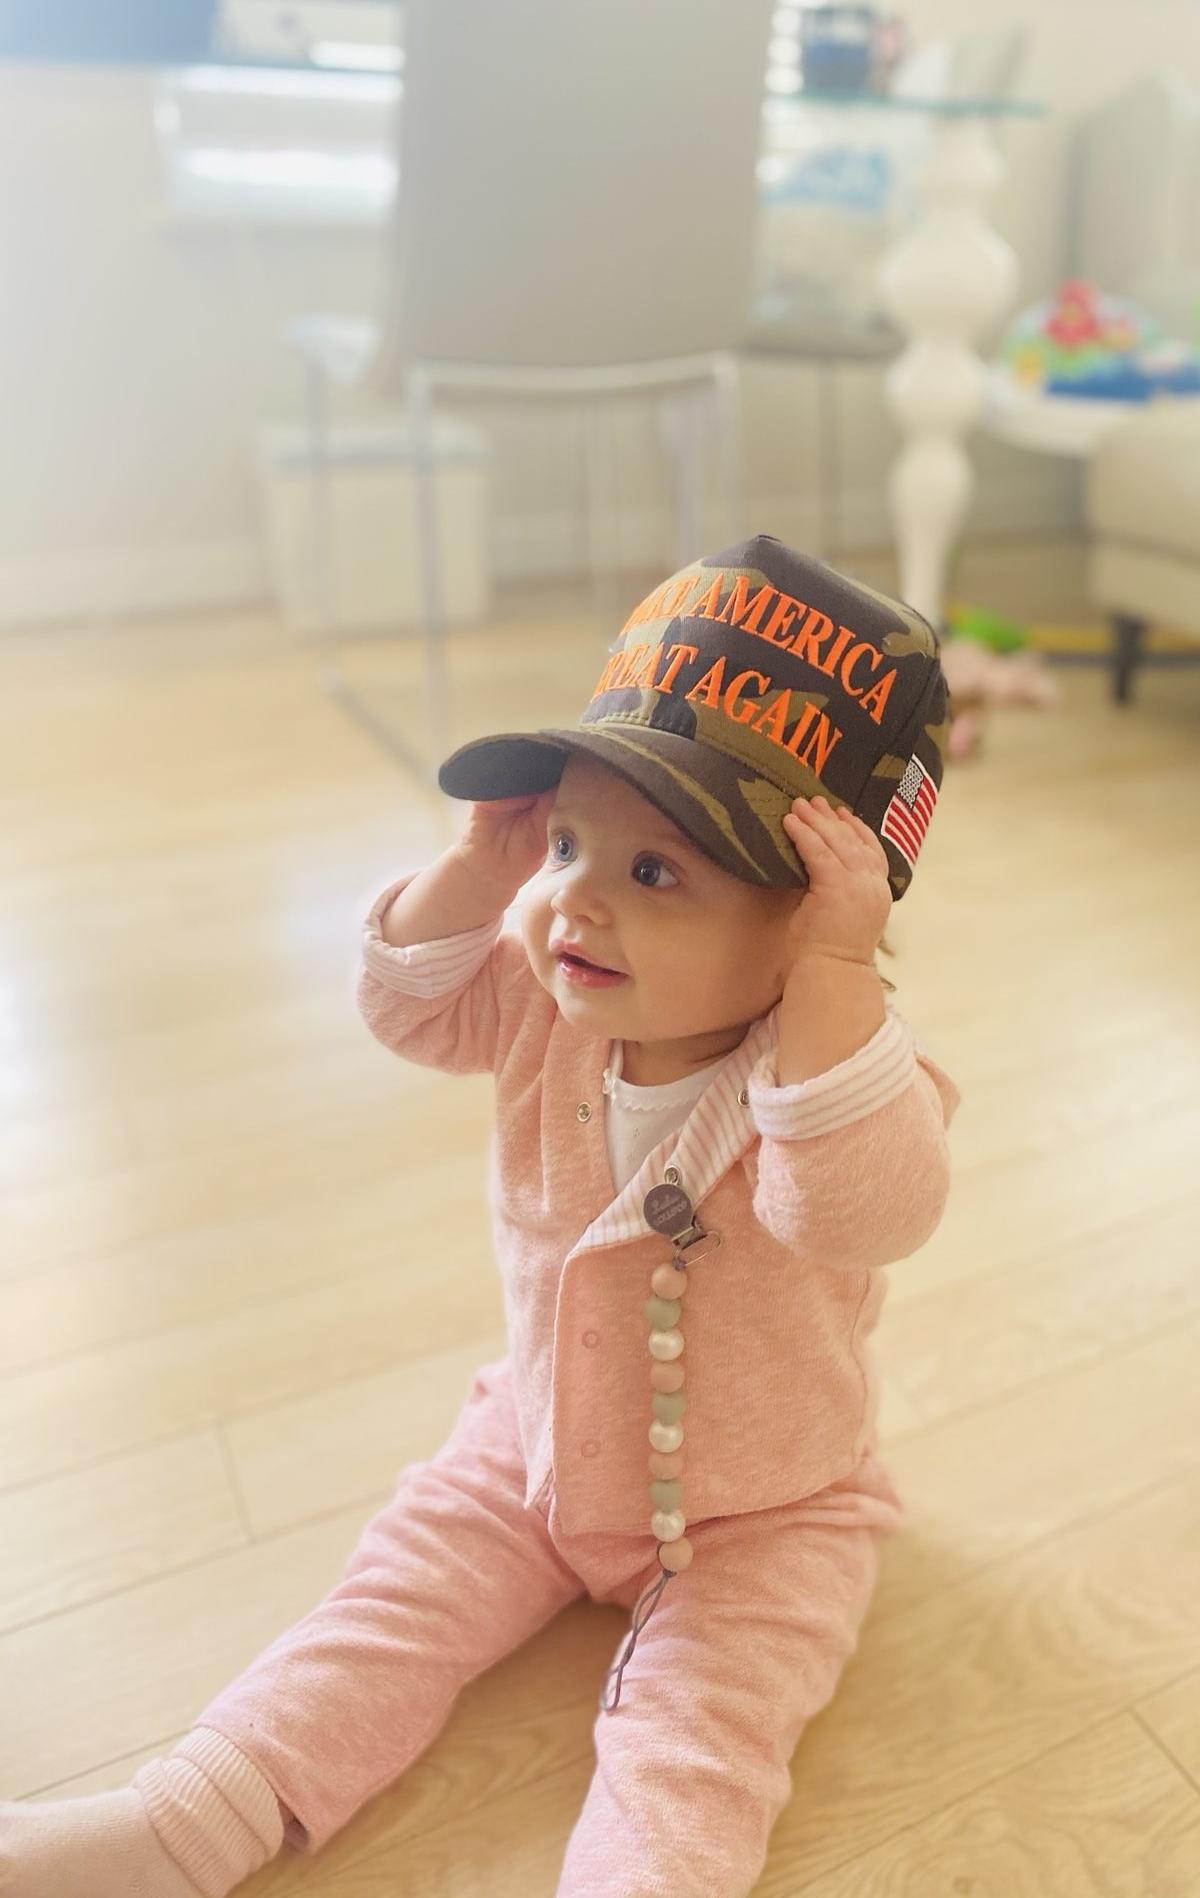 Kayleigh McEnany's baby wearing a Maga cap